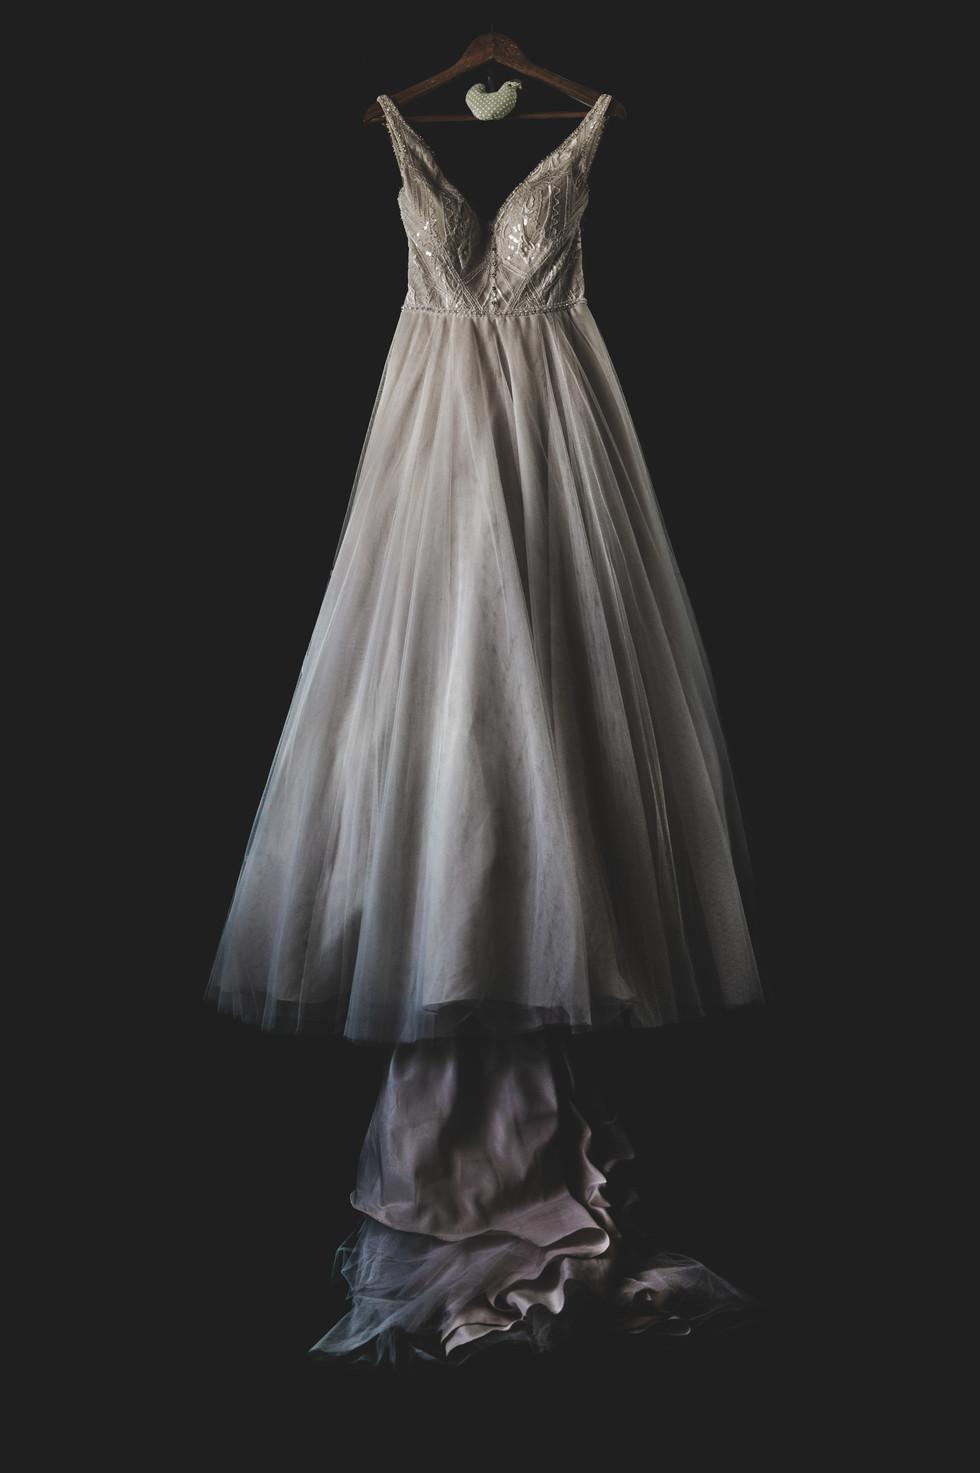 wiltshire-wedding-photography-263.JPG